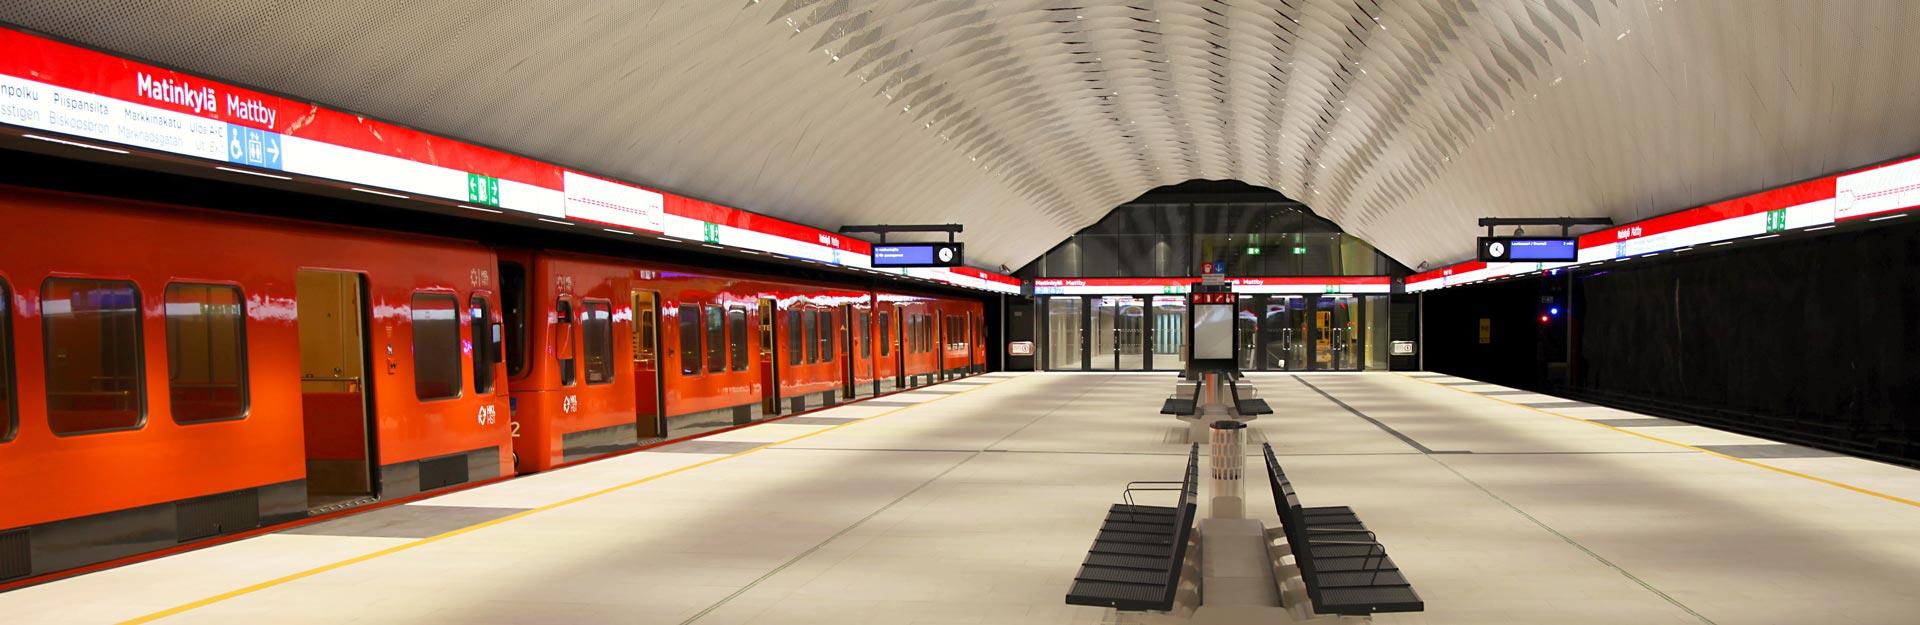 En tunnelbana vid Mattbys metrostation.